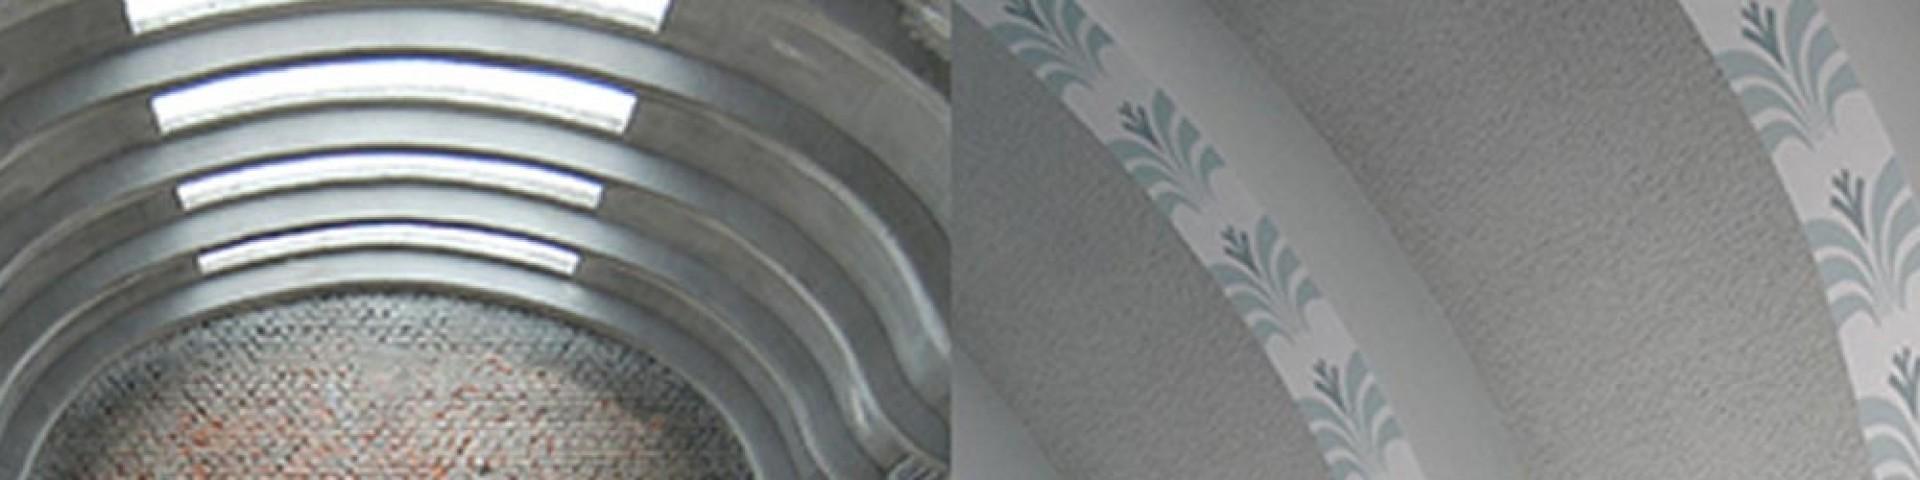 Reinforcement with textile reinforced concrete